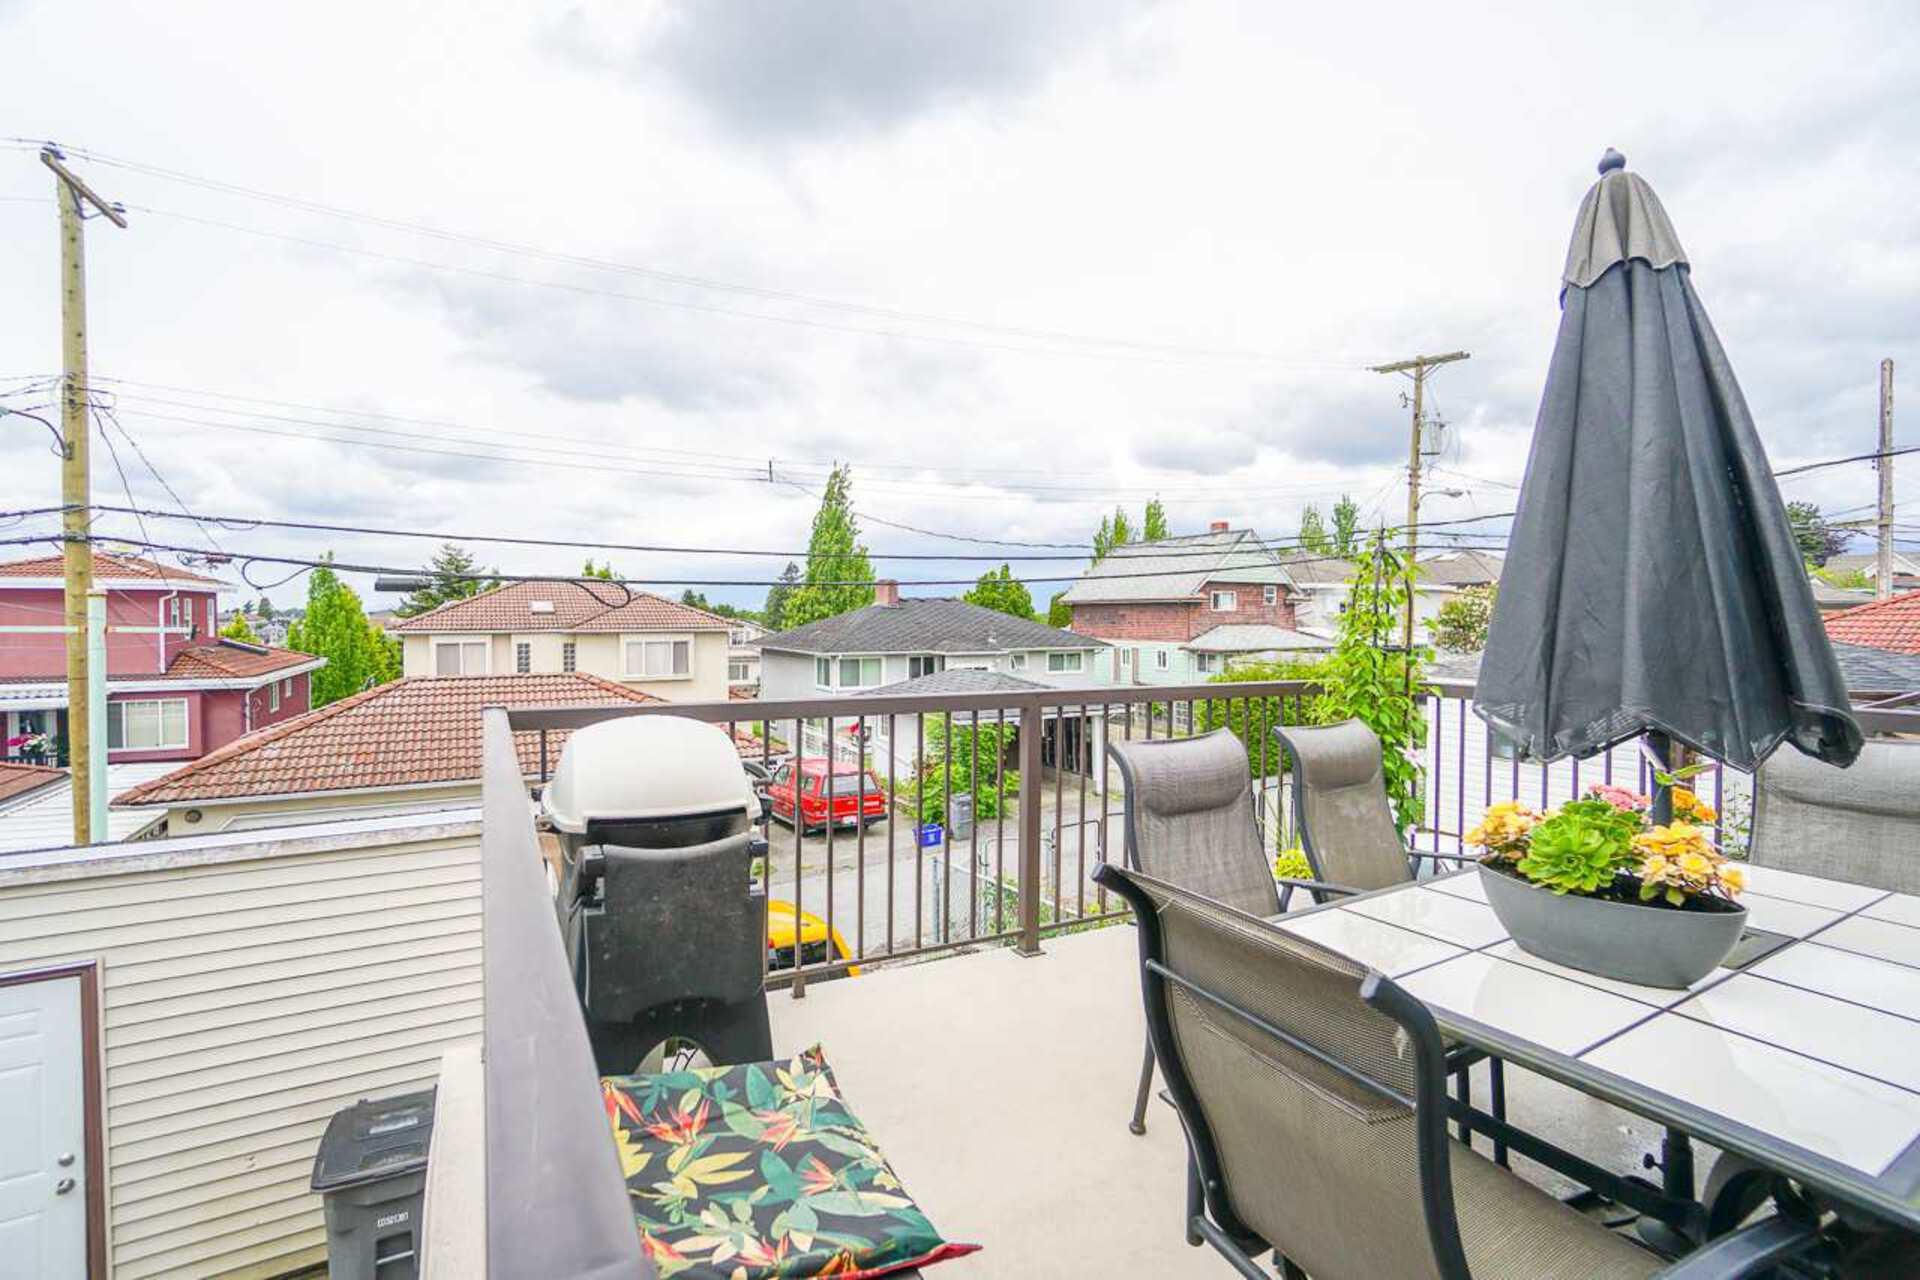 4843-payne-street-collingwood-ve-vancouver-east-36 of 4843 Payne Street, Collingwood VE, Vancouver East